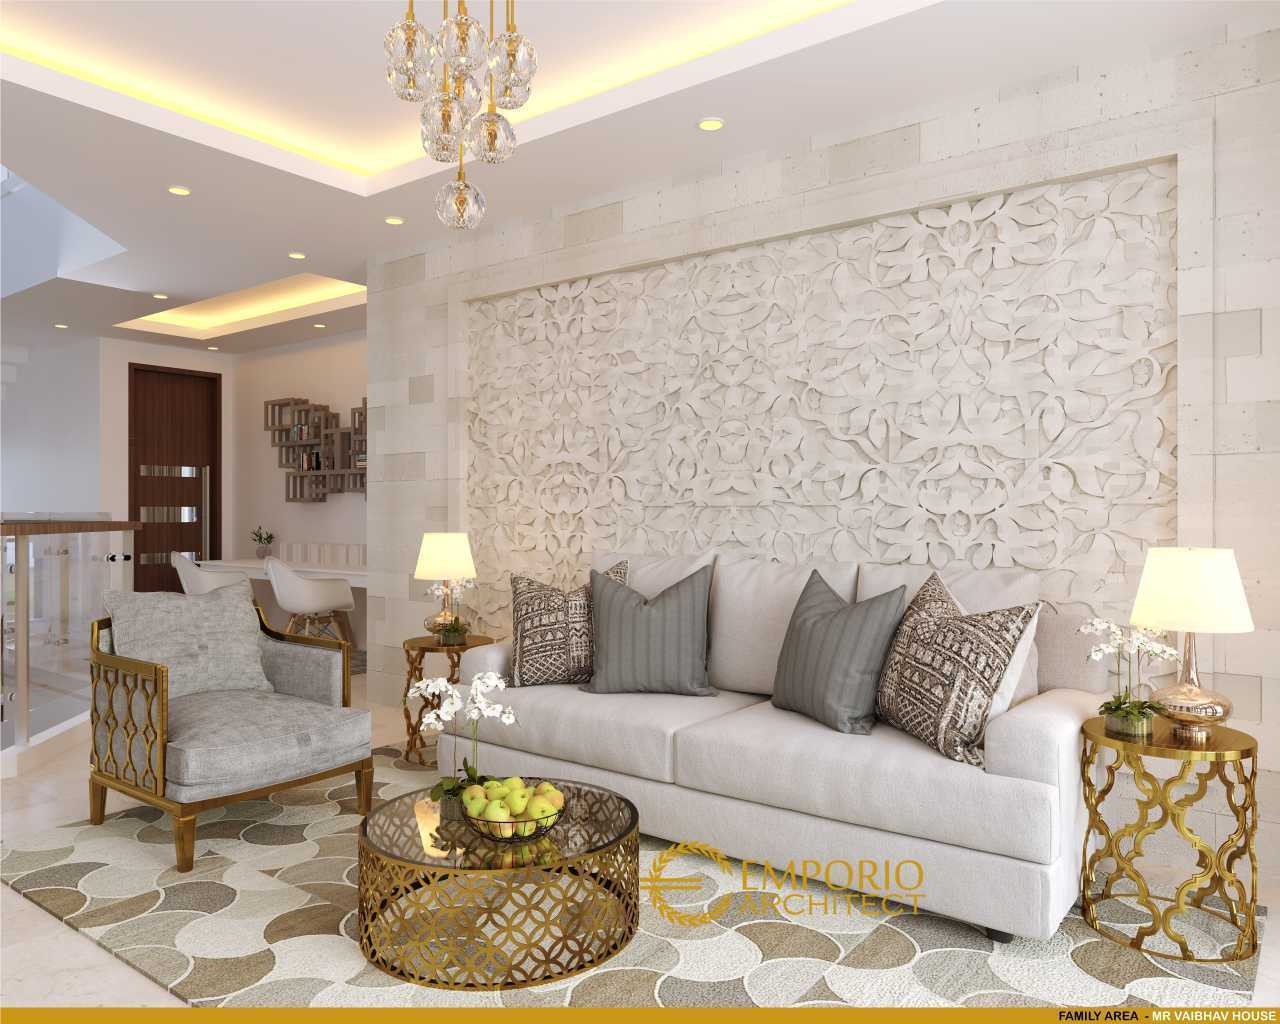 Emporio Architect Jasa Arsitek India Desain Rumah Villa Bali 2 Lantai 724 @ India India India Emporio-Architect-Jasa-Arsitek-India-Desain-Rumah-Villa-Bali-2-Lantai-724-India  93945